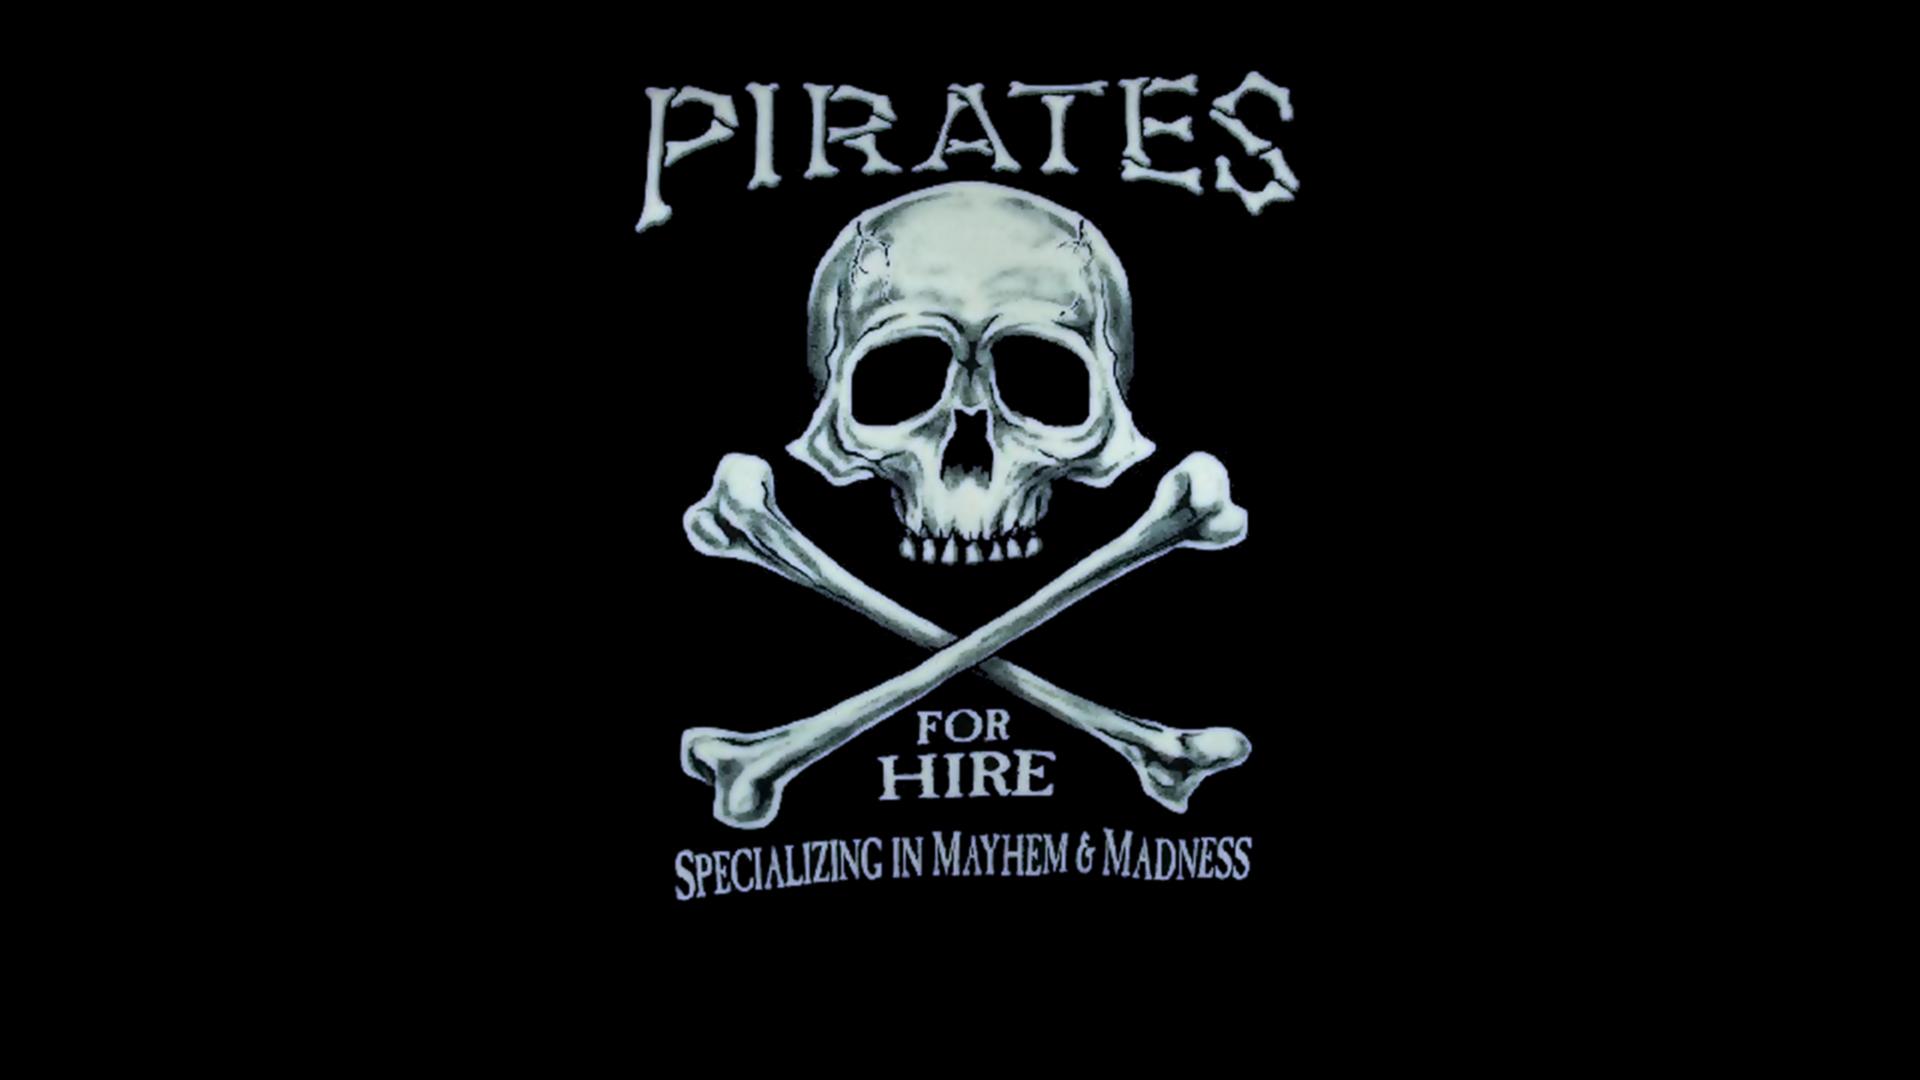 Pirates Wallpaper 1920x1080 Pirates 1920x1080